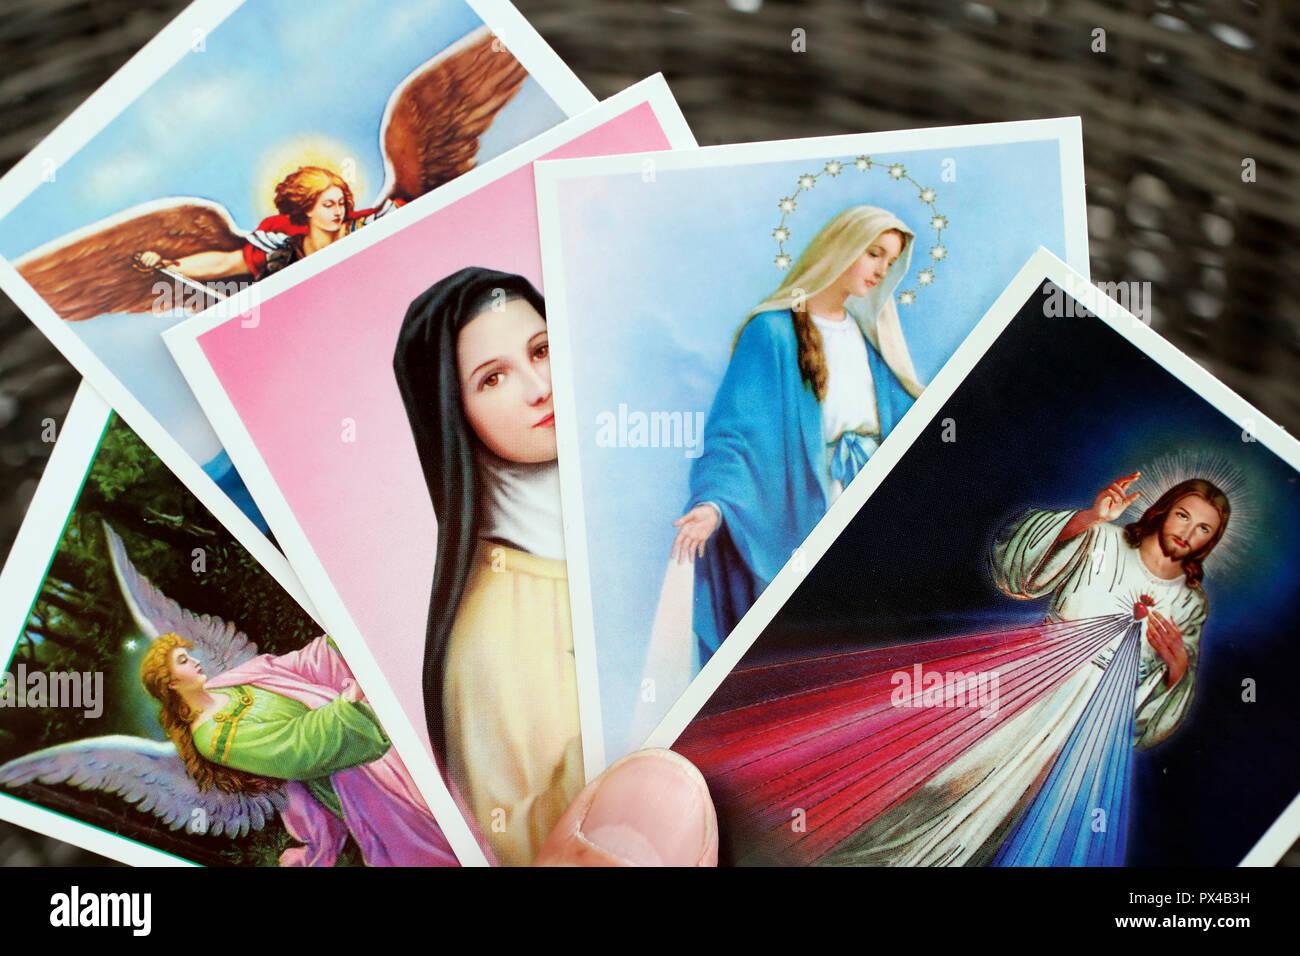 Heilige Bilder: Jesus, Maria, Engel. Stockbild